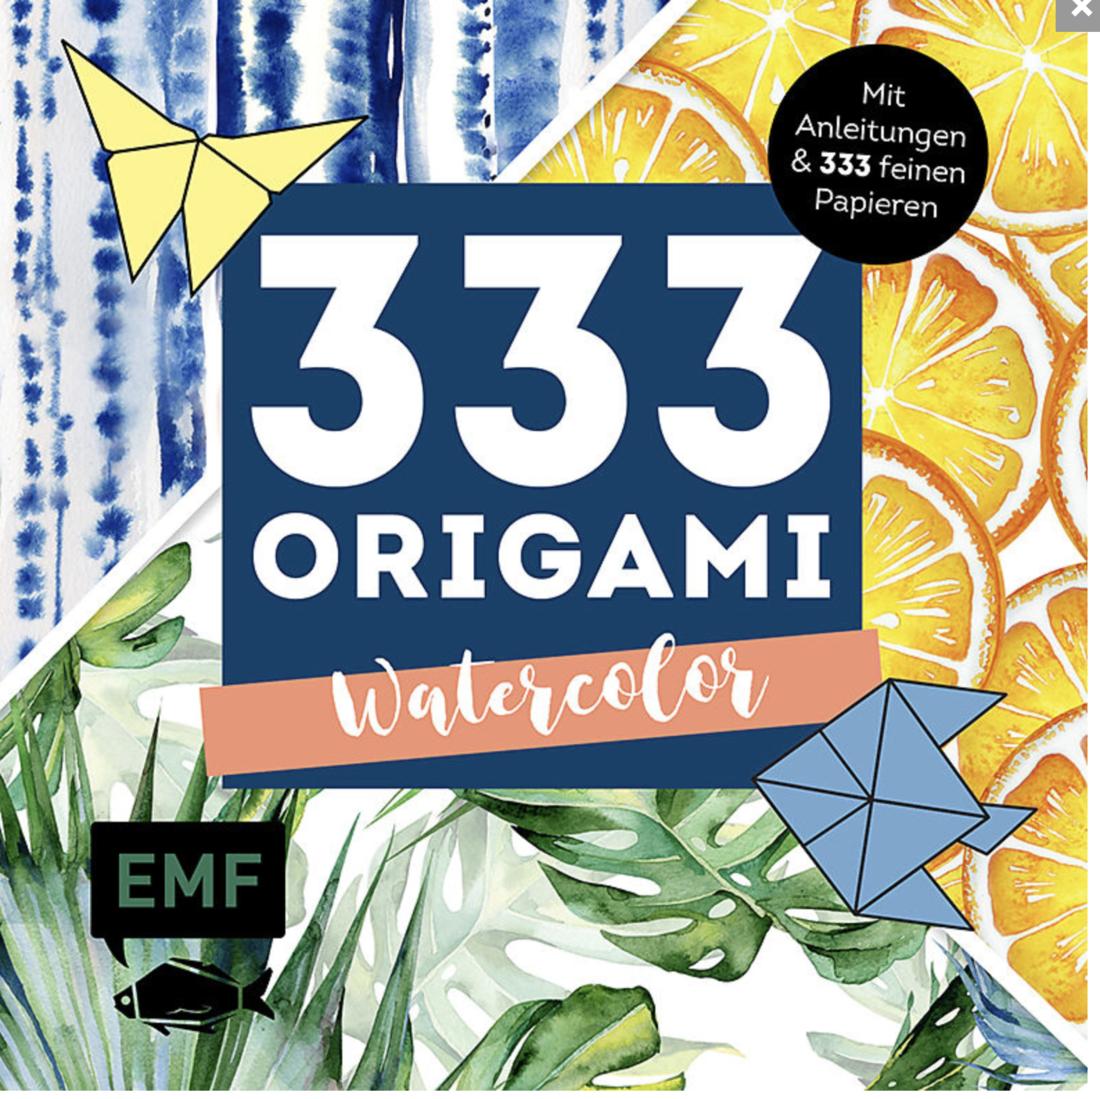 333 Origami  «Watercolor»